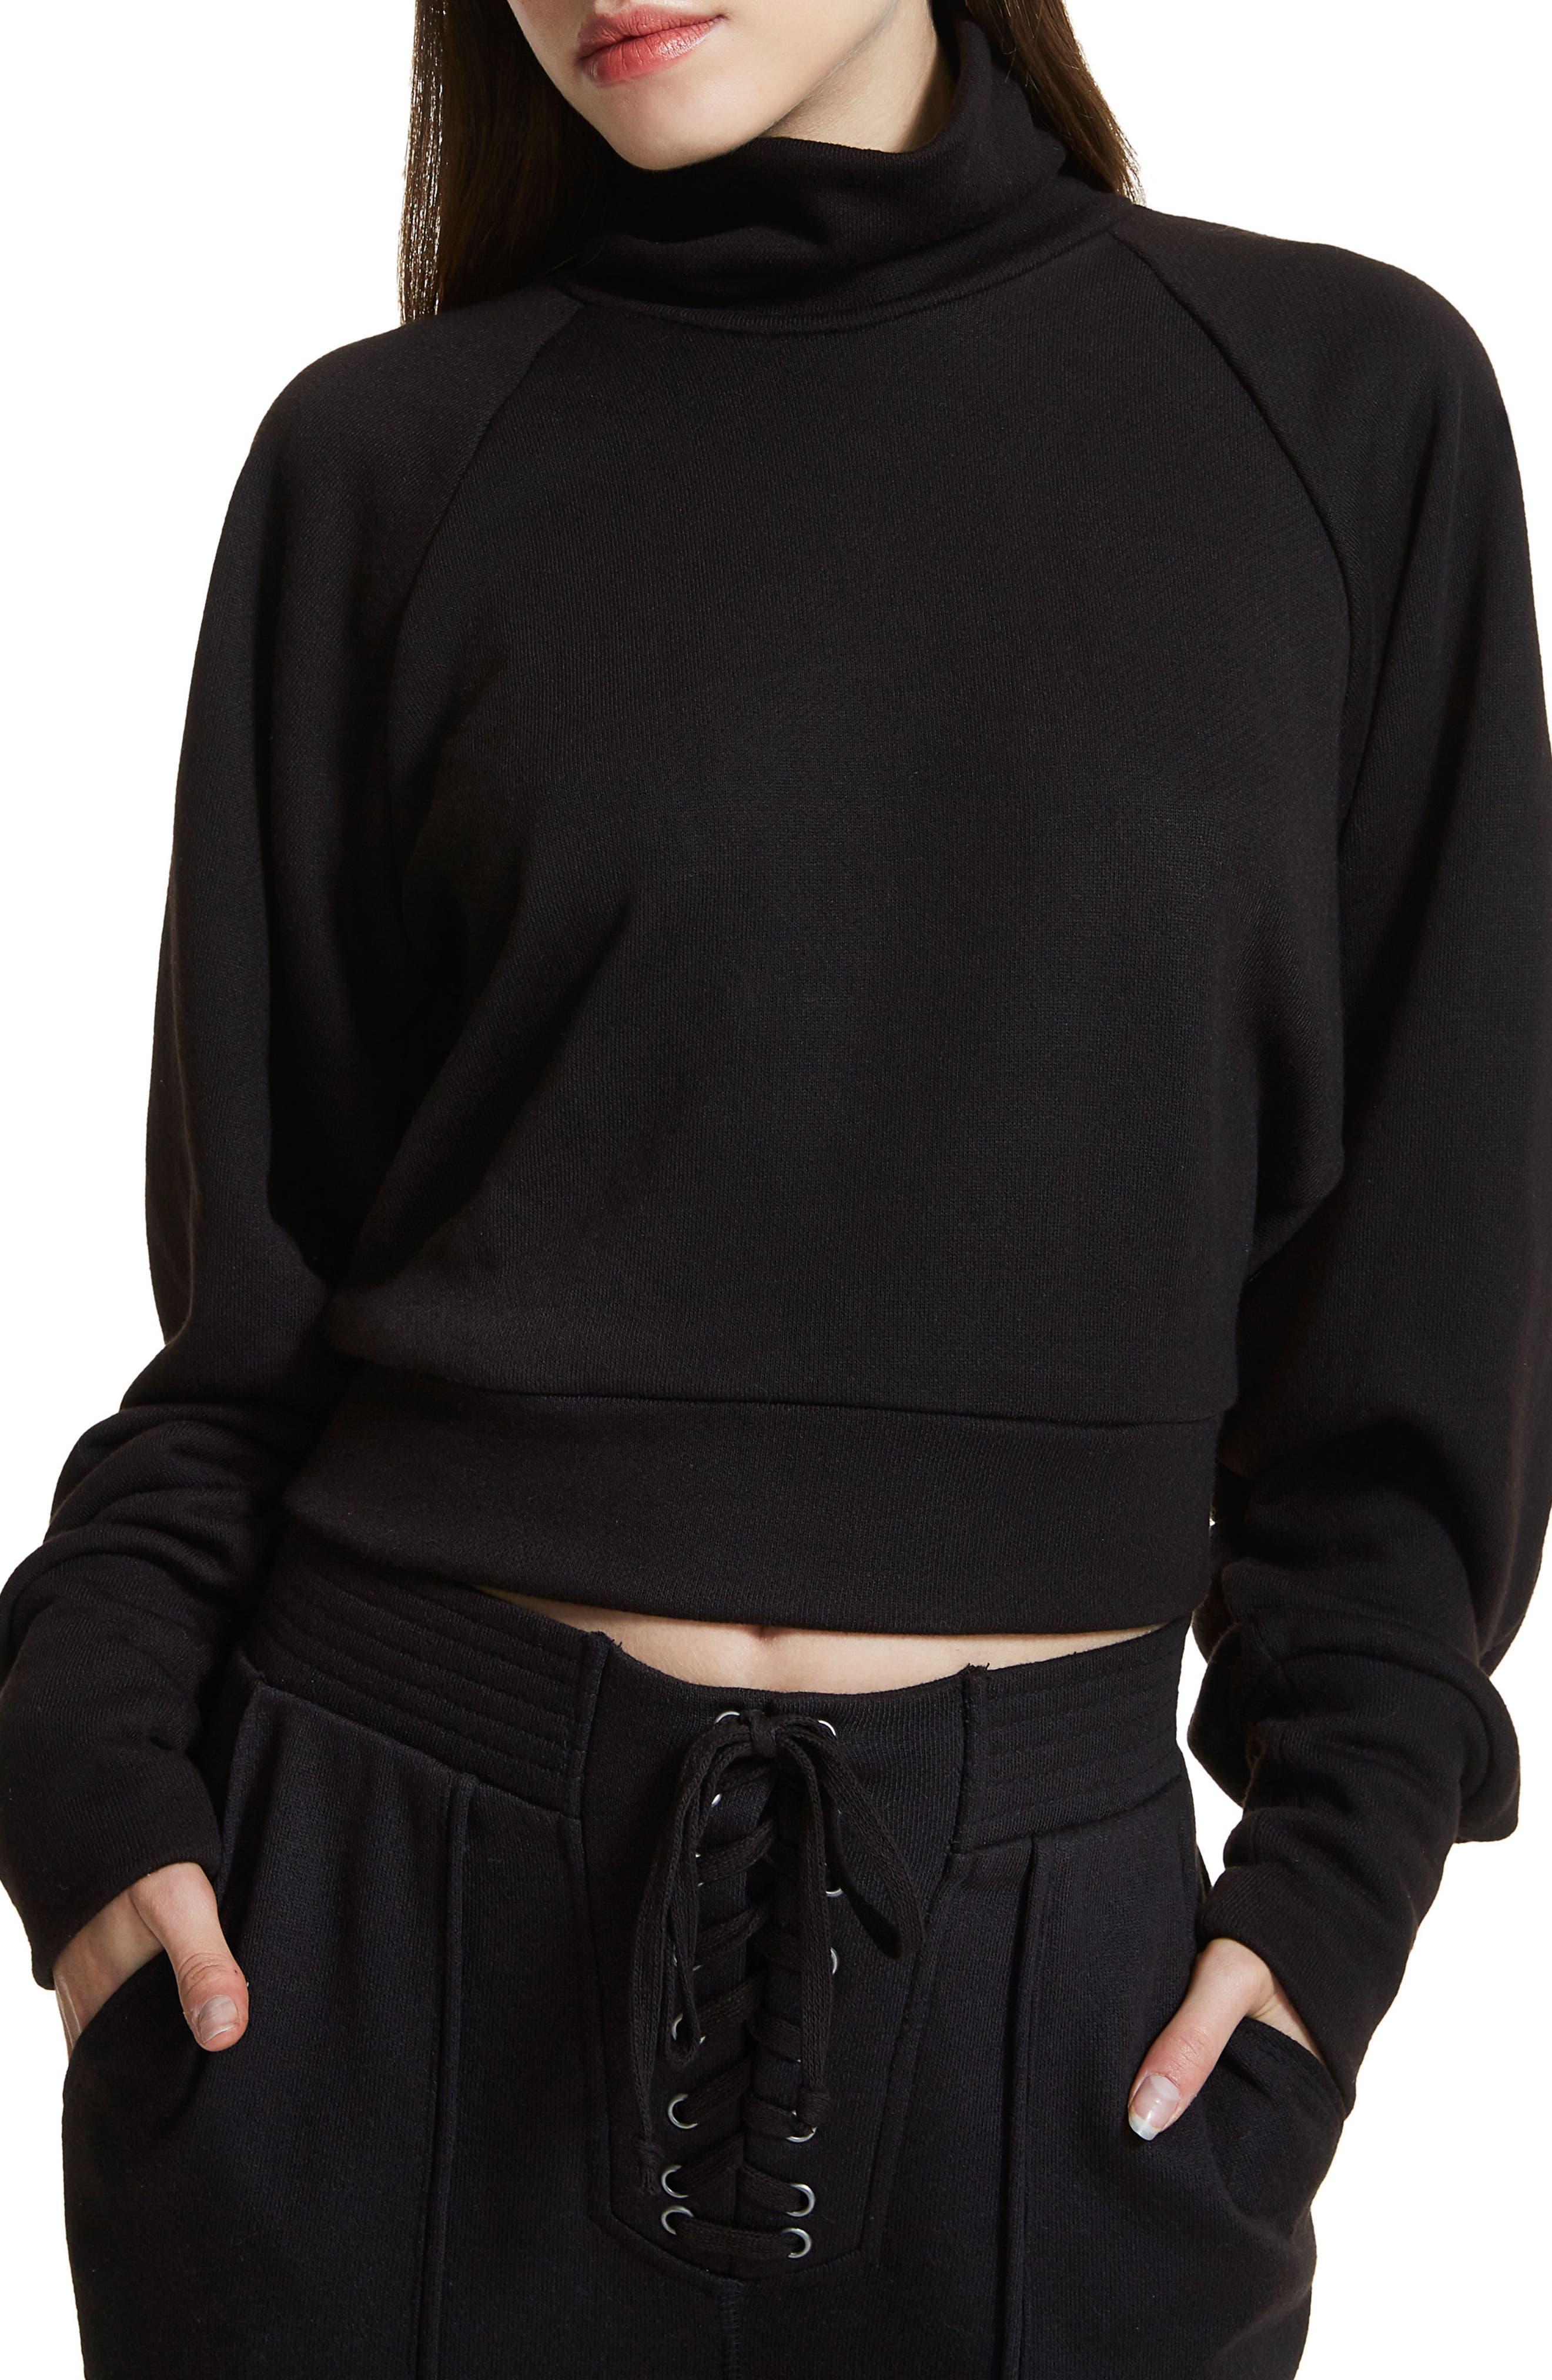 AFRM Jaxon Crop Turtleneck Sweatshirt